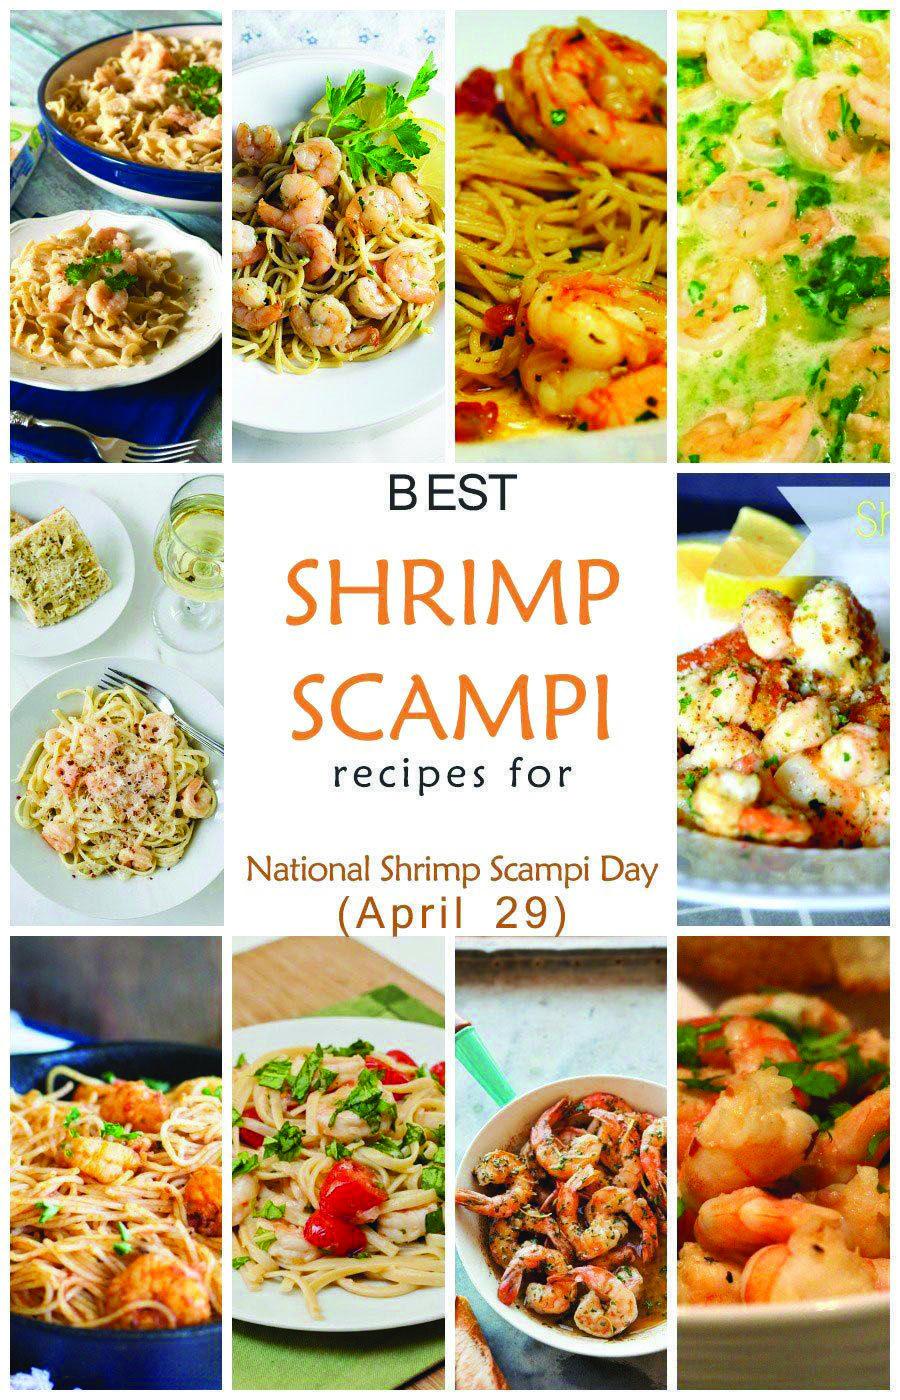 SHRIMP SCAMPI RECIPE #shrimpscampi Best Anytime easy shrimp scampi recipe with italian dressing developed by nutritionists. #shrimpscampi